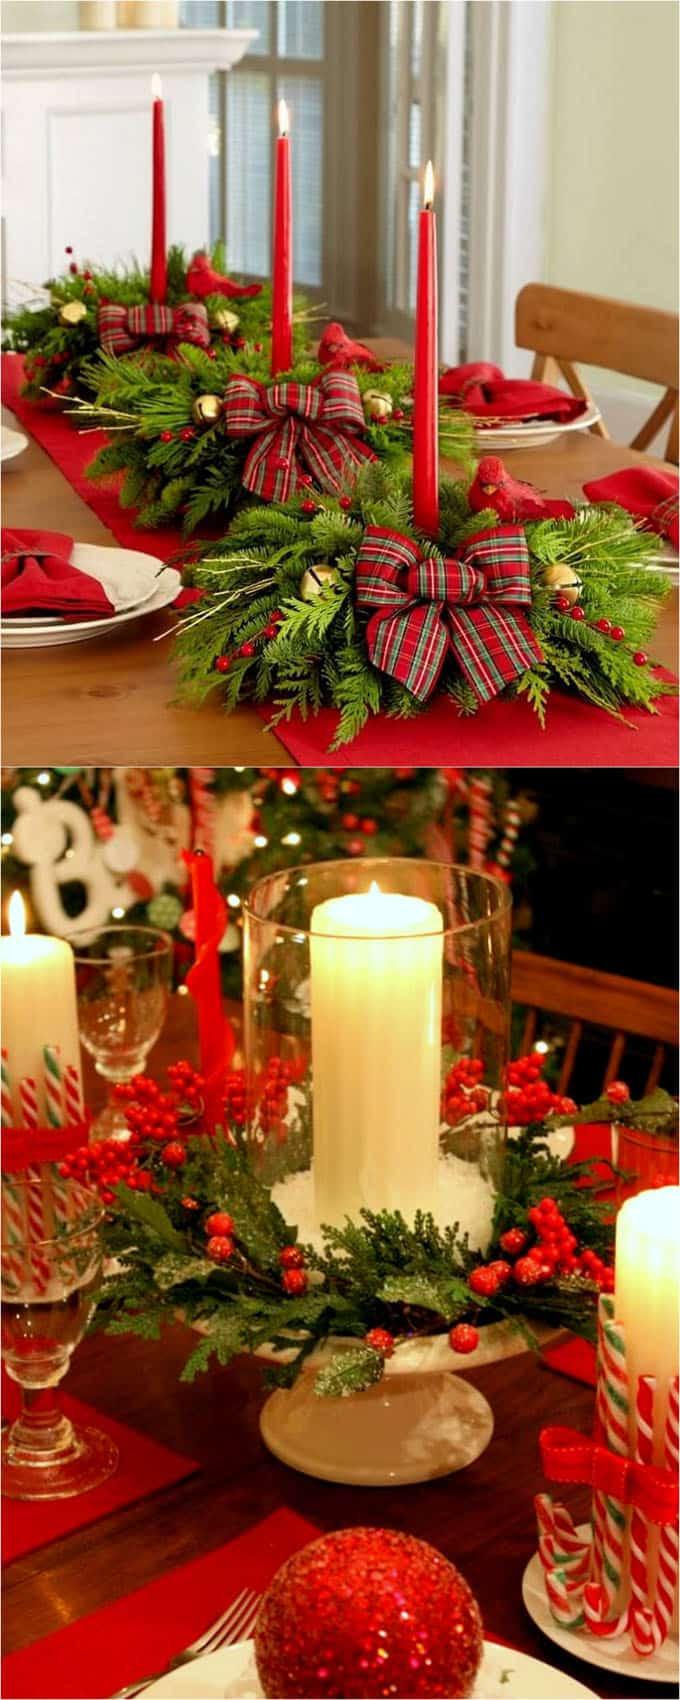 DIY Christmas Decorations Pinterest  27 Gorgeous DIY Thanksgiving & Christmas Table Decorations